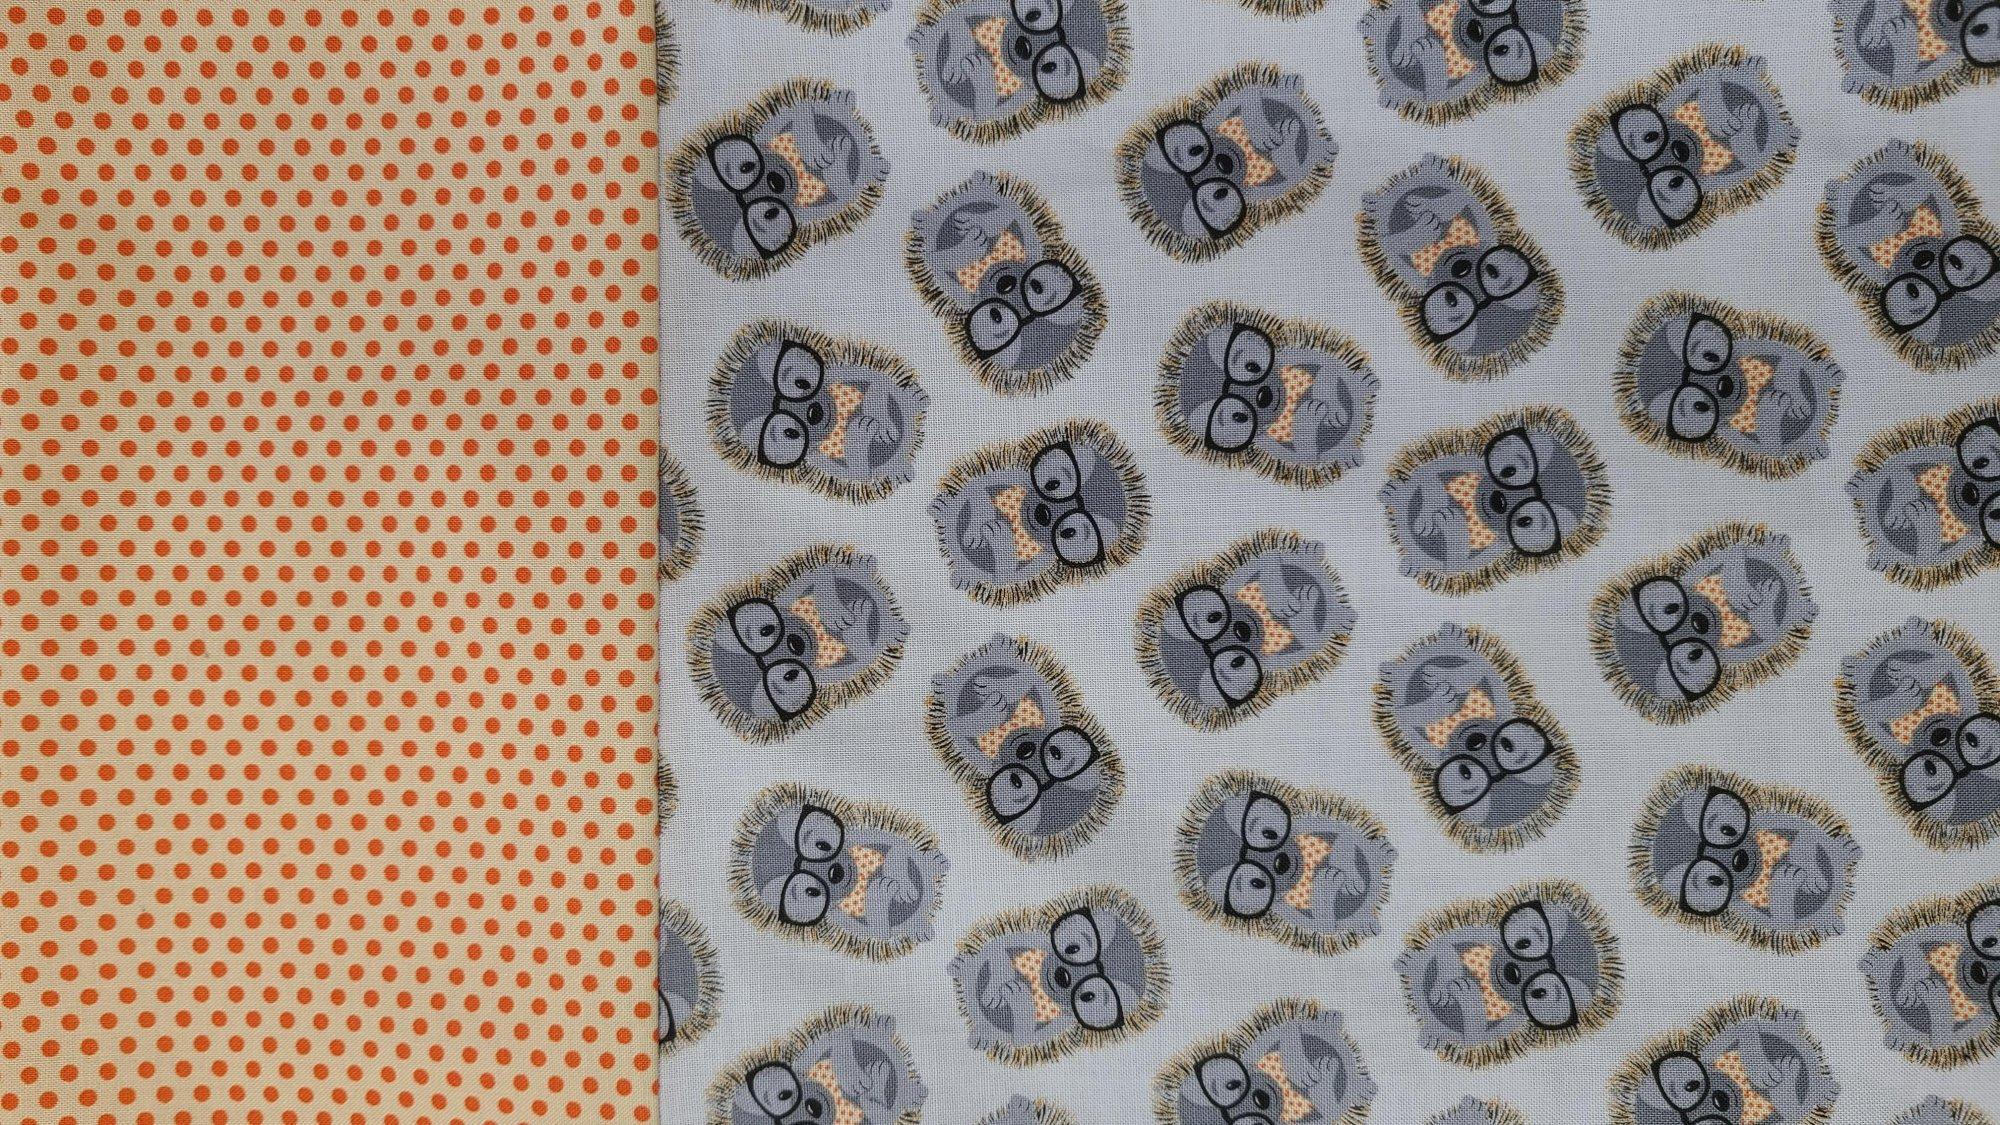 Wild & Free Hedgehog Pillowcase Kit